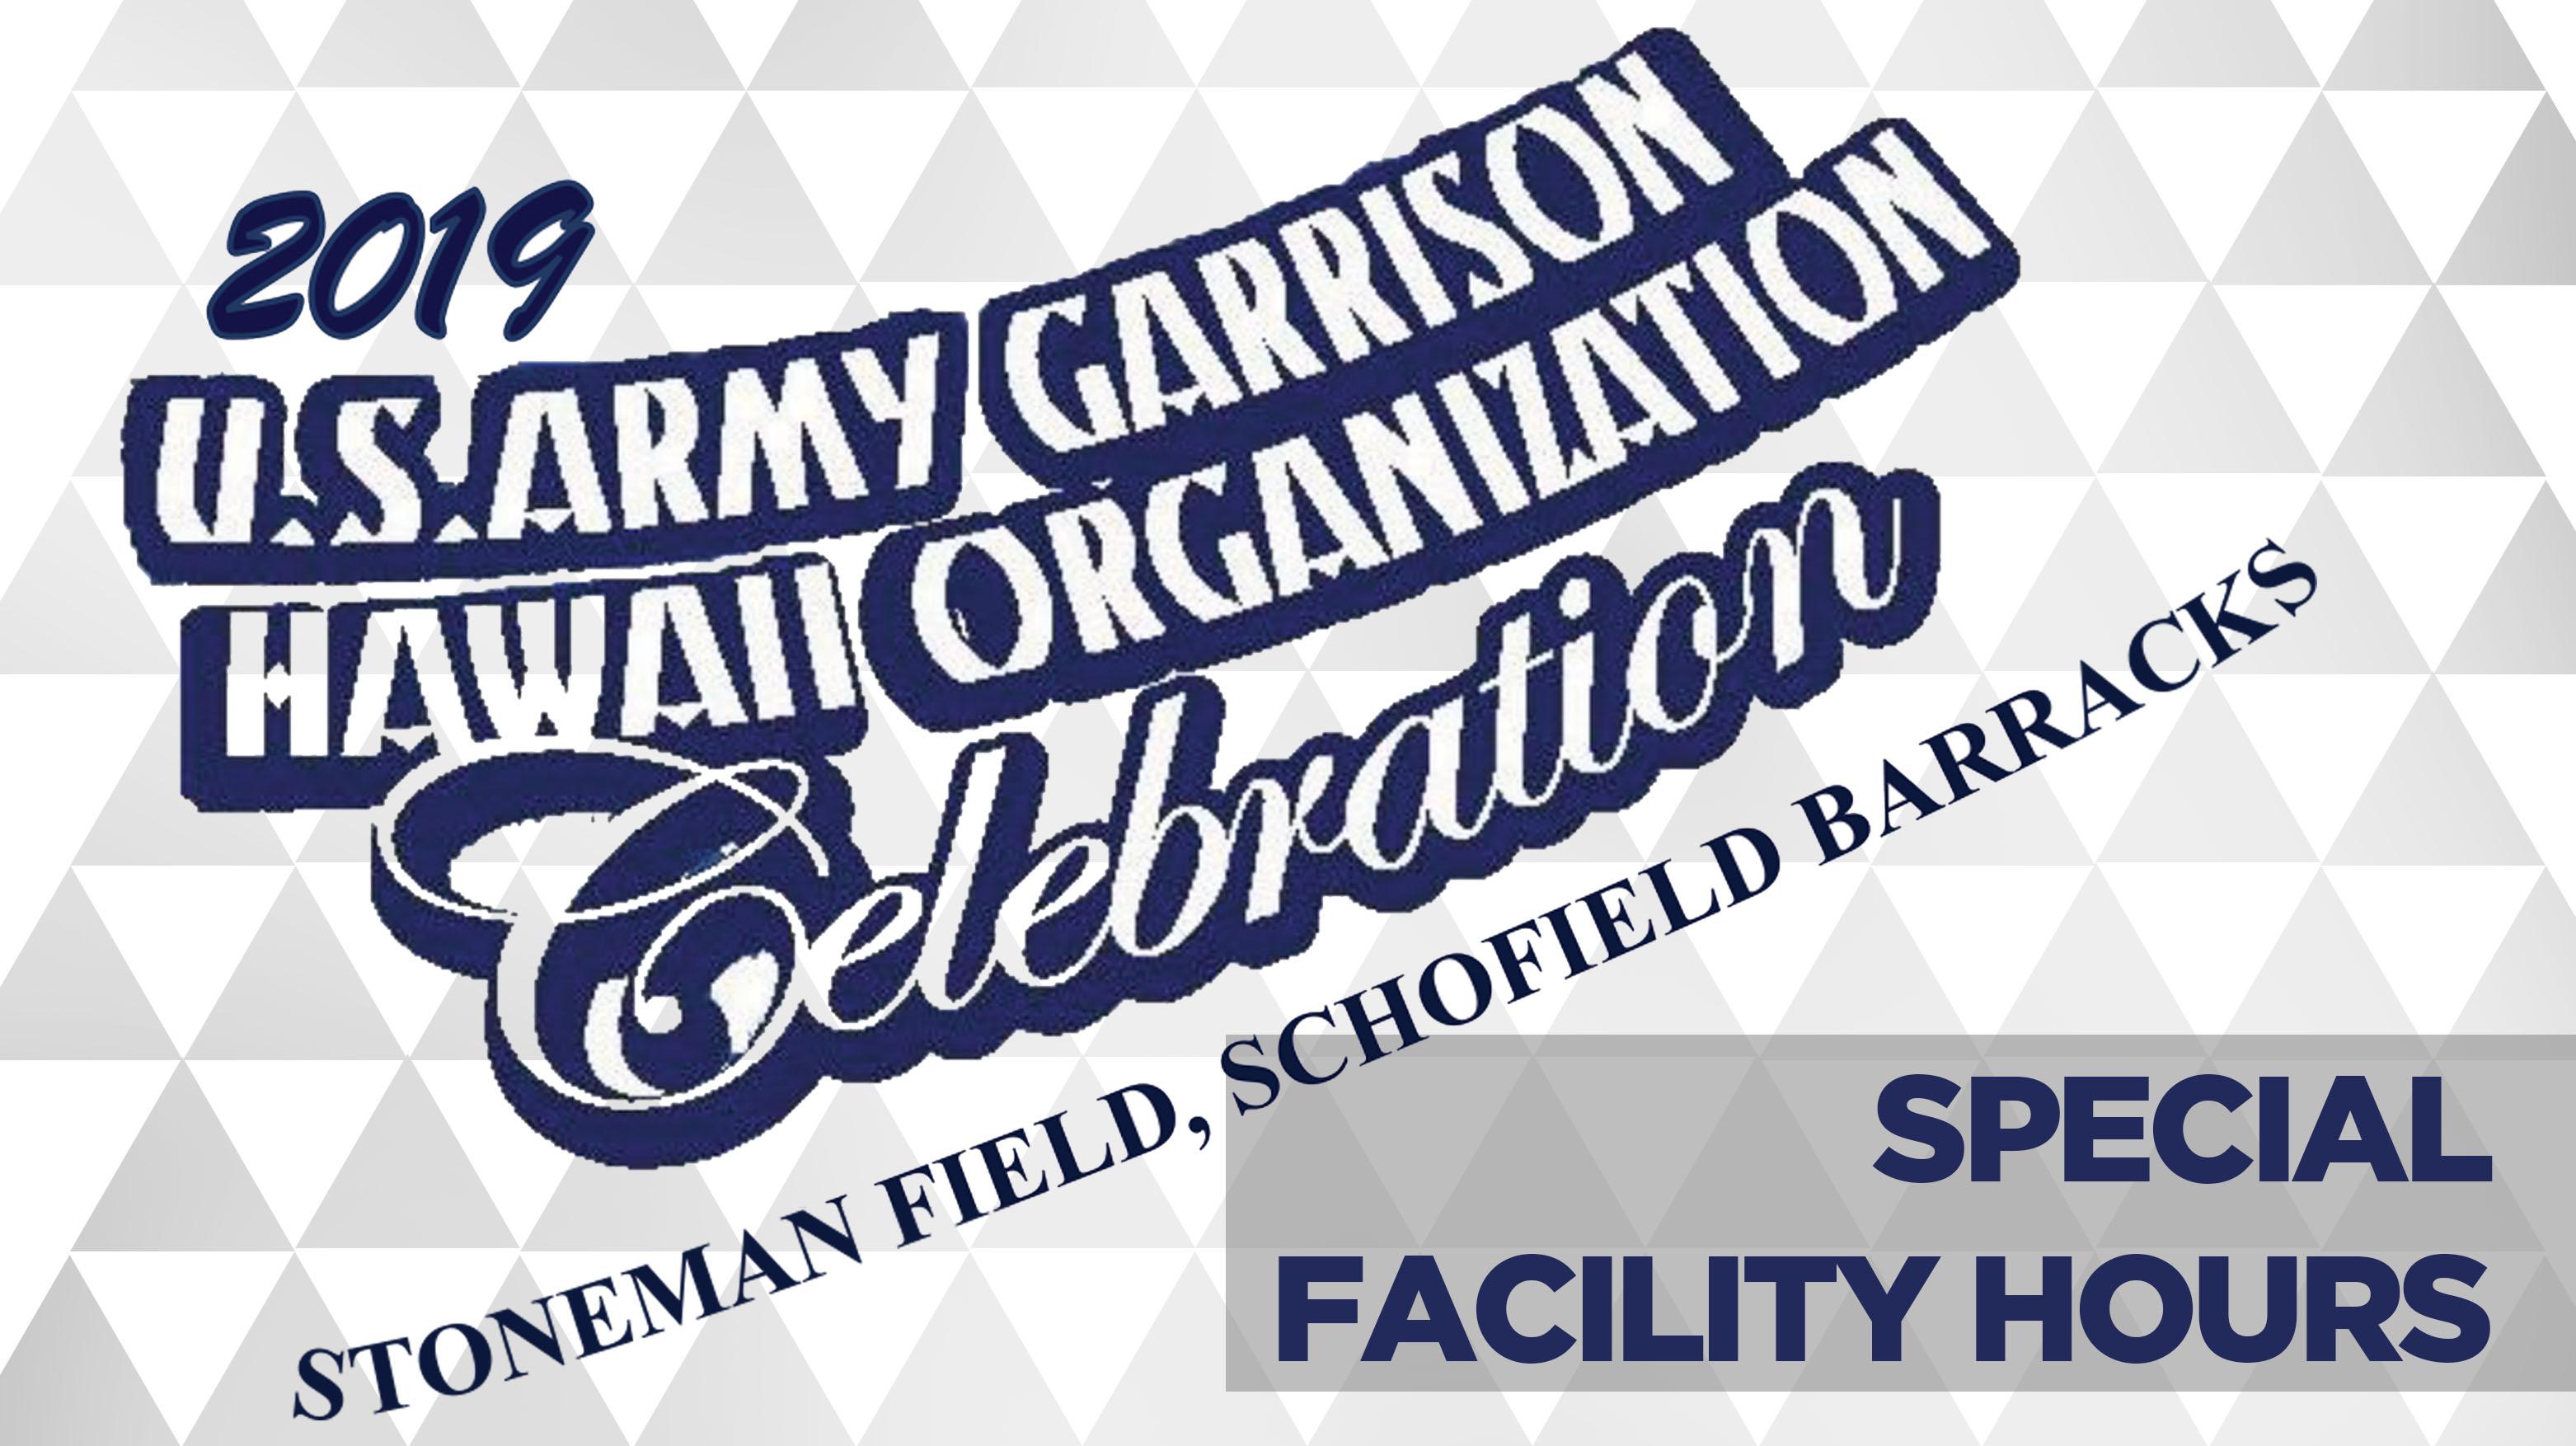 Garrison Organization Celebration Facility Hours